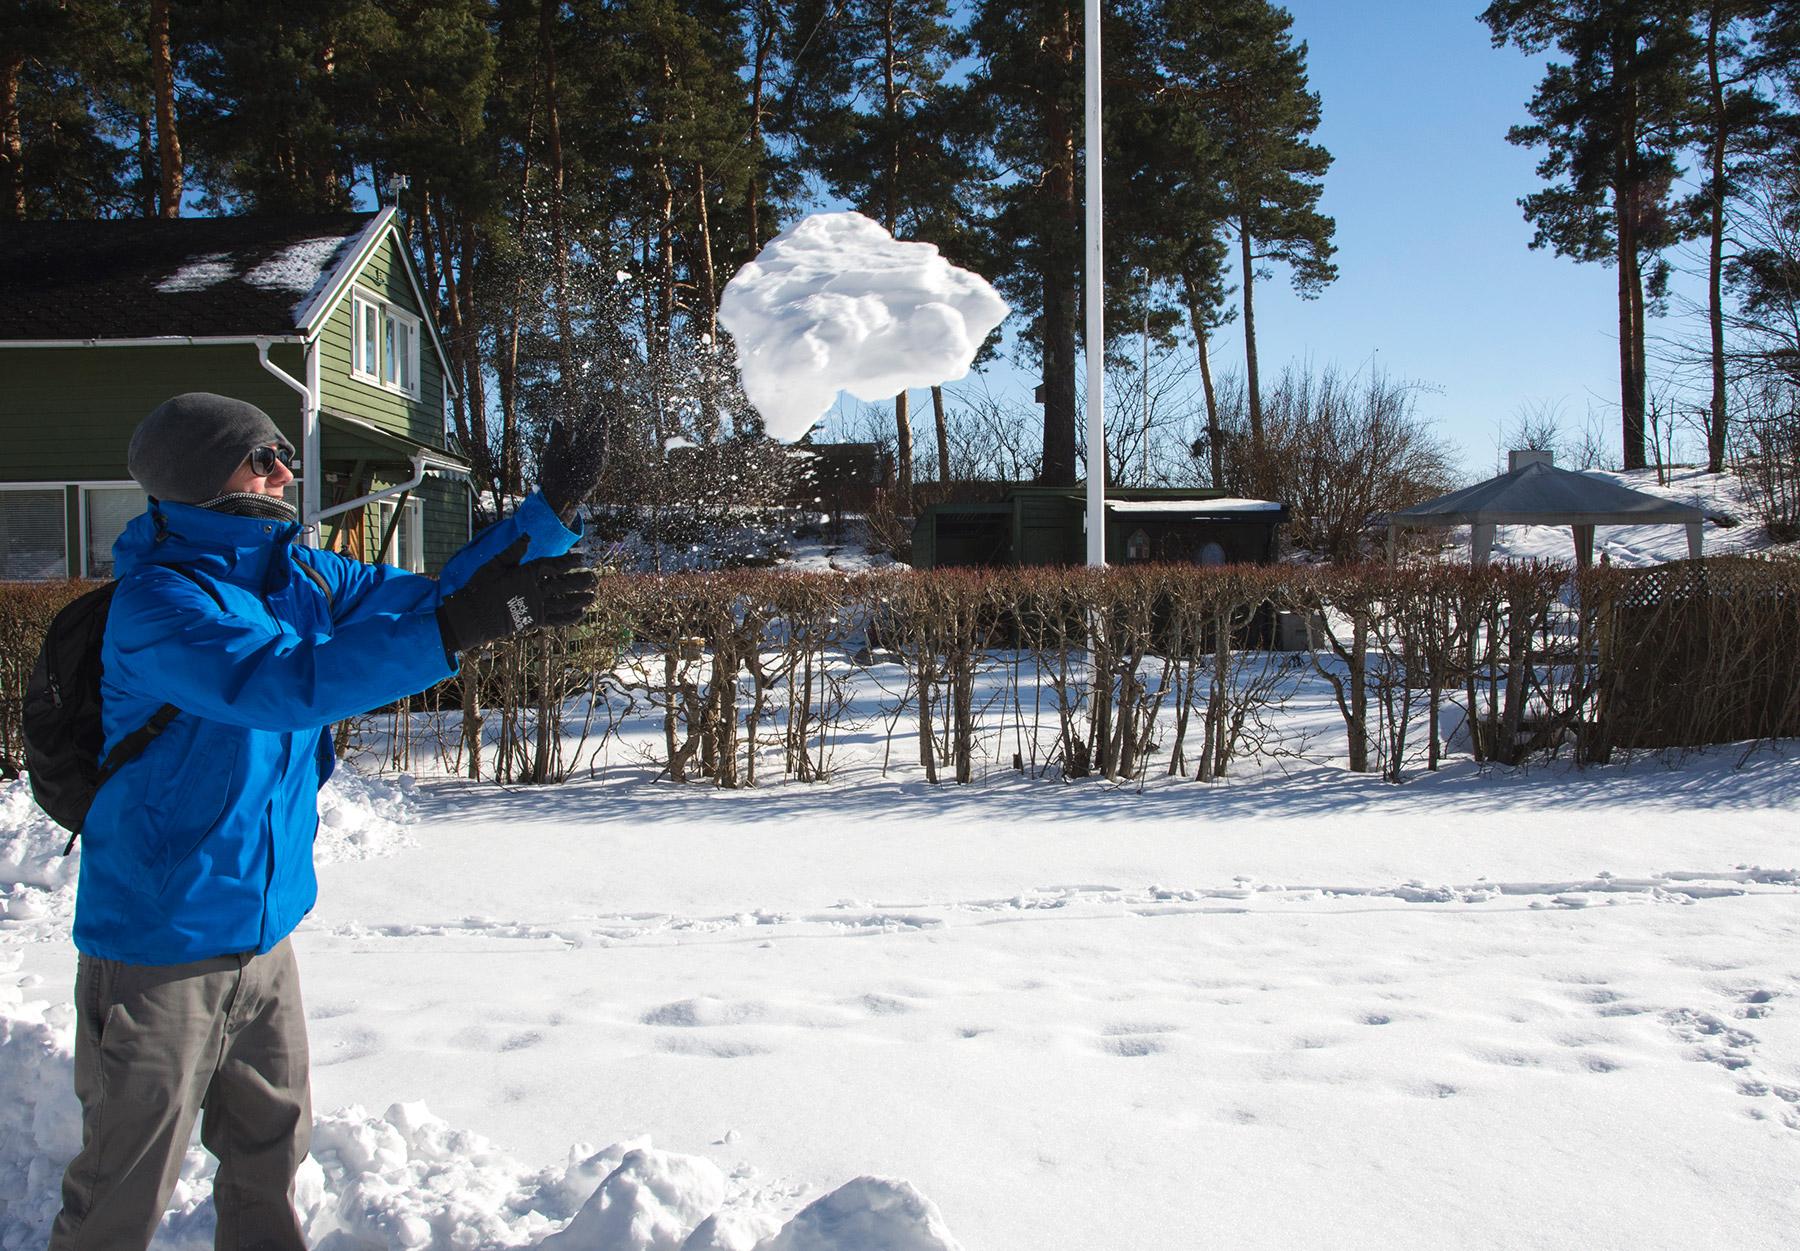 Man throwing giant snowball